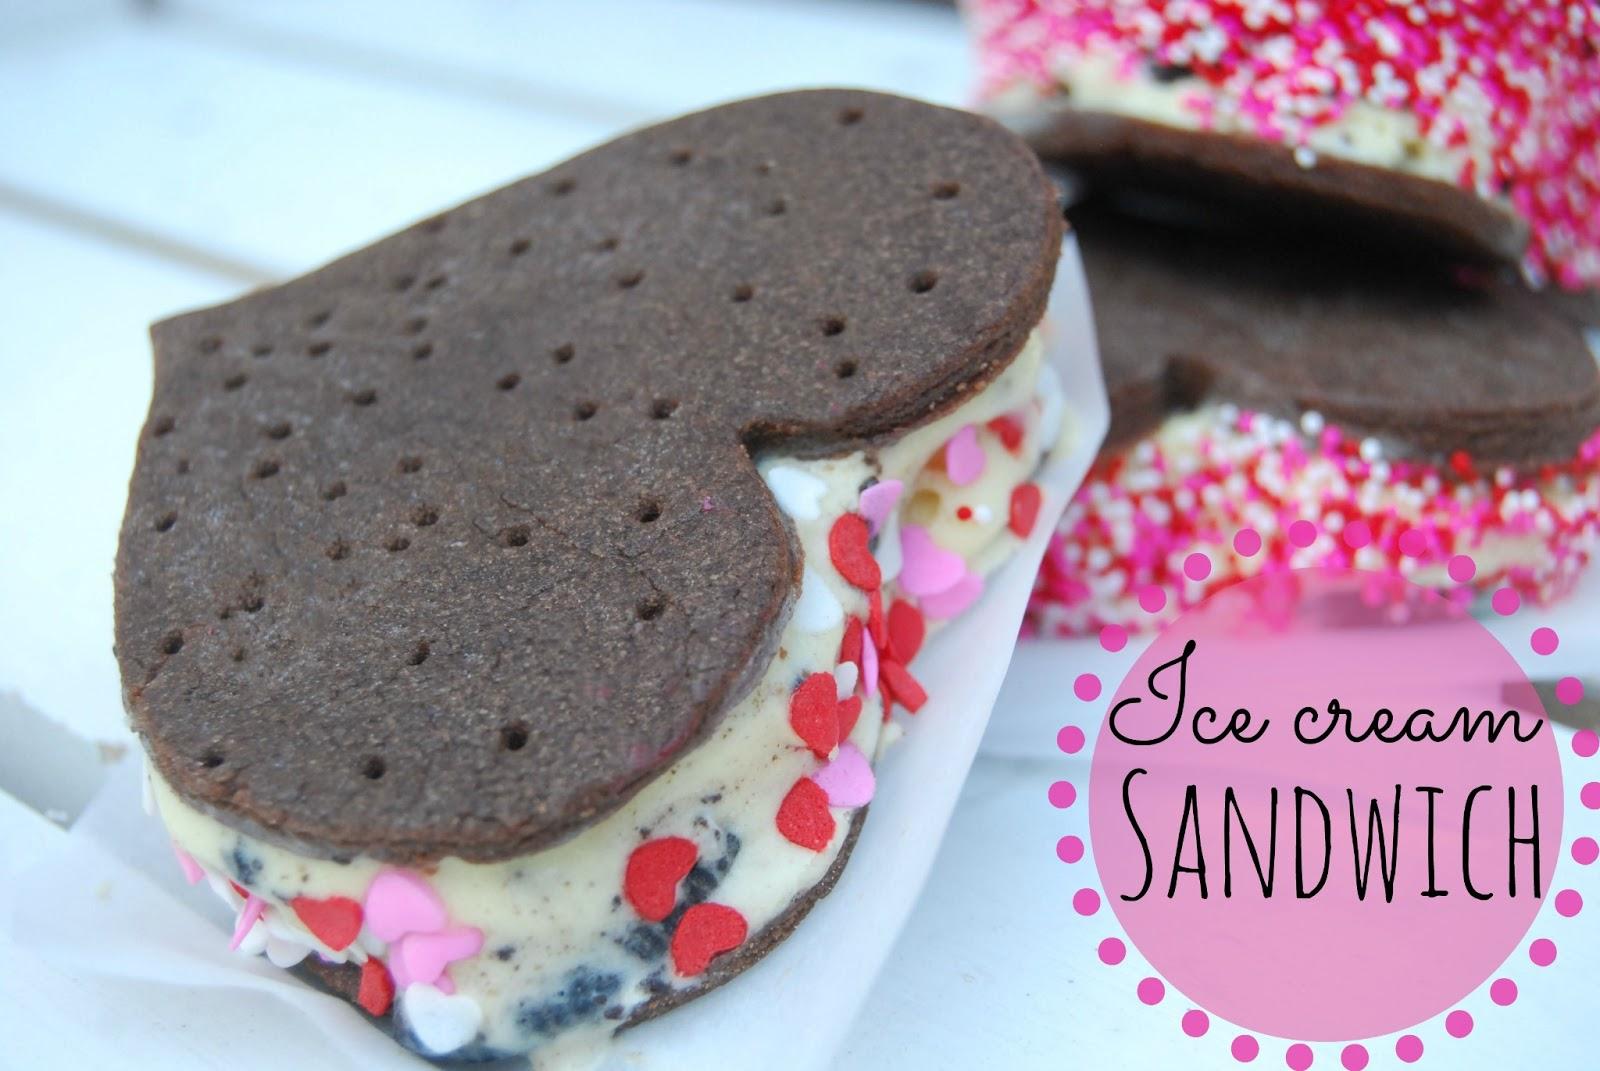 Homemade Ice Cream Sandwiches with homemade Ice cream